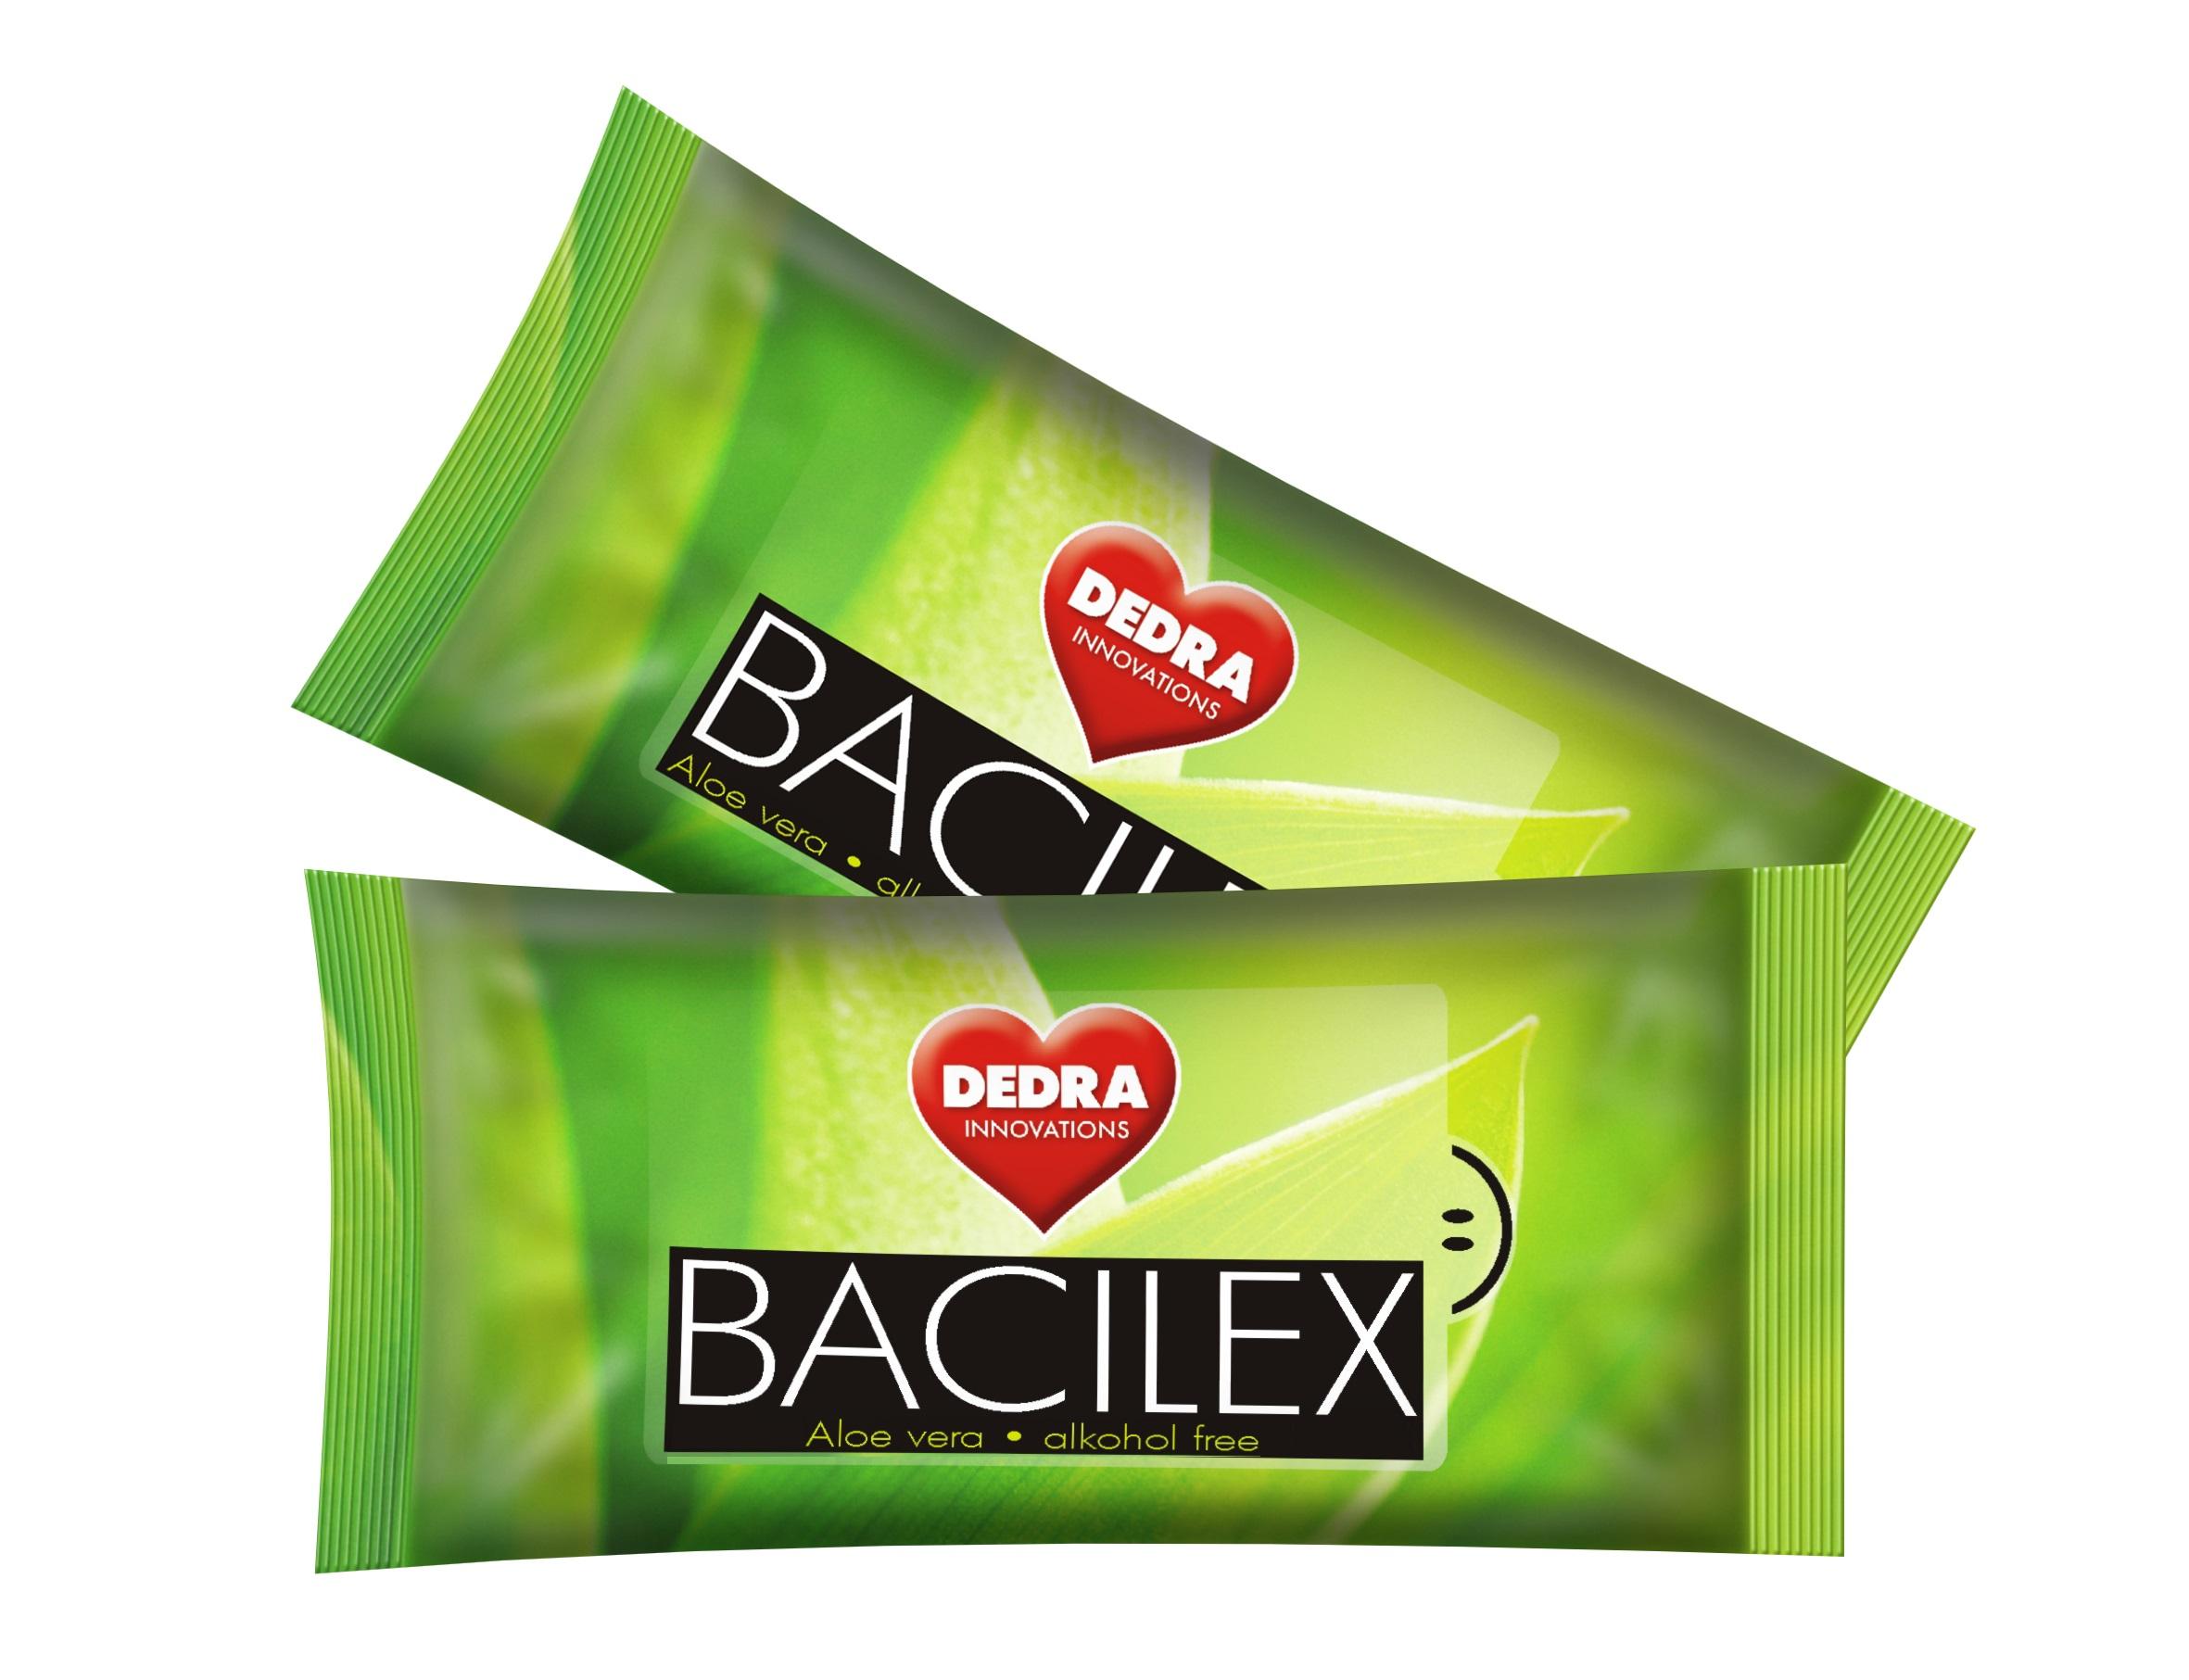 Sada BACILEX hygienické vlhčené ubrousky